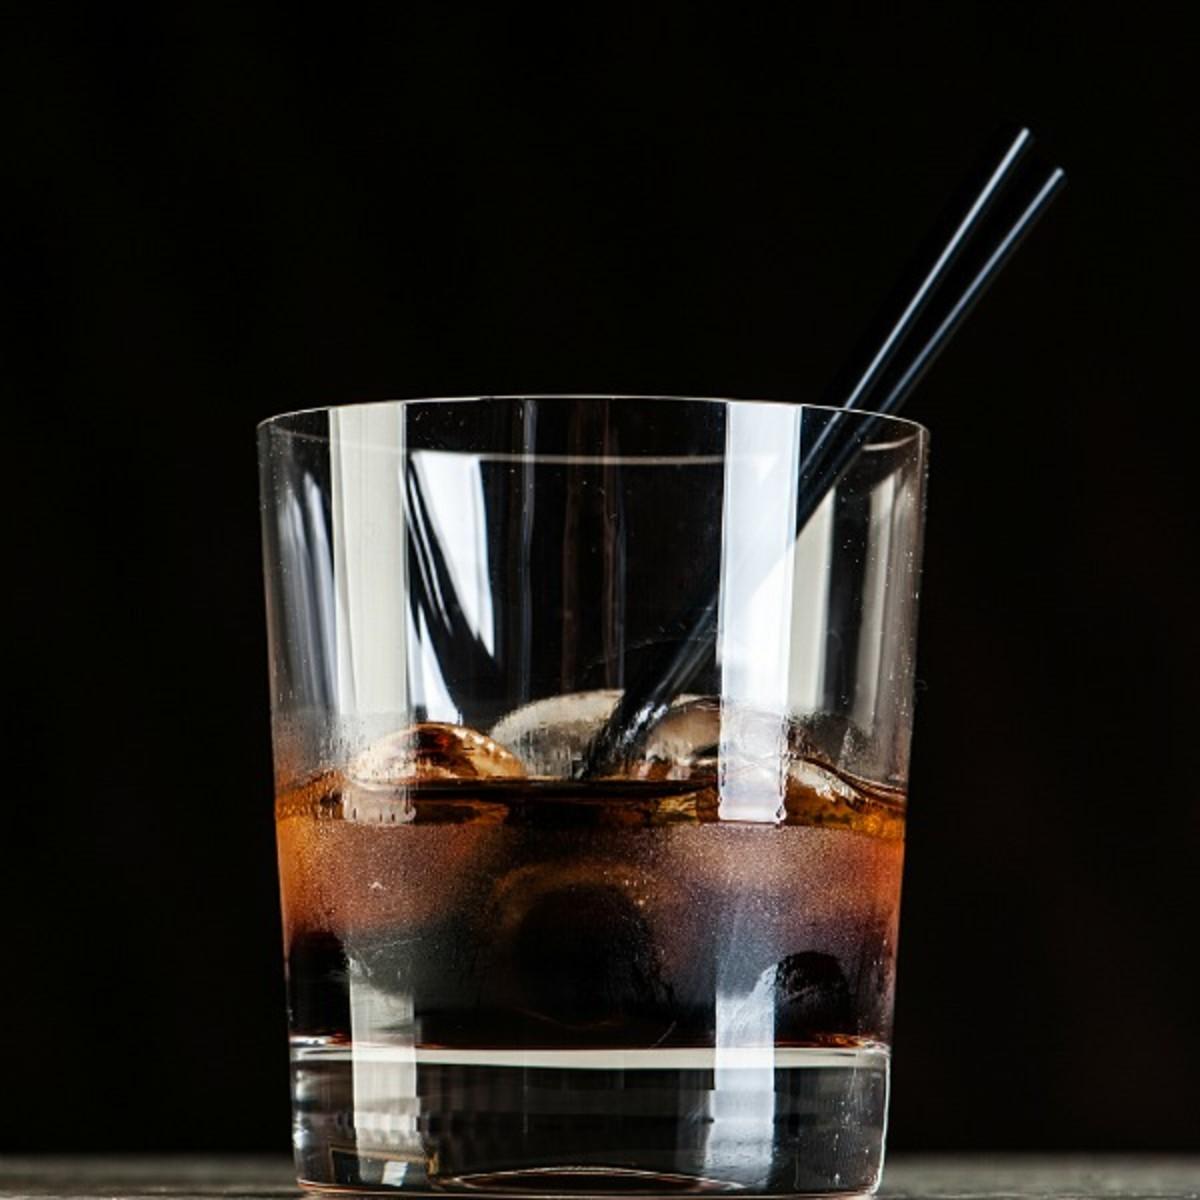 caribbean kiss cocktail with morad